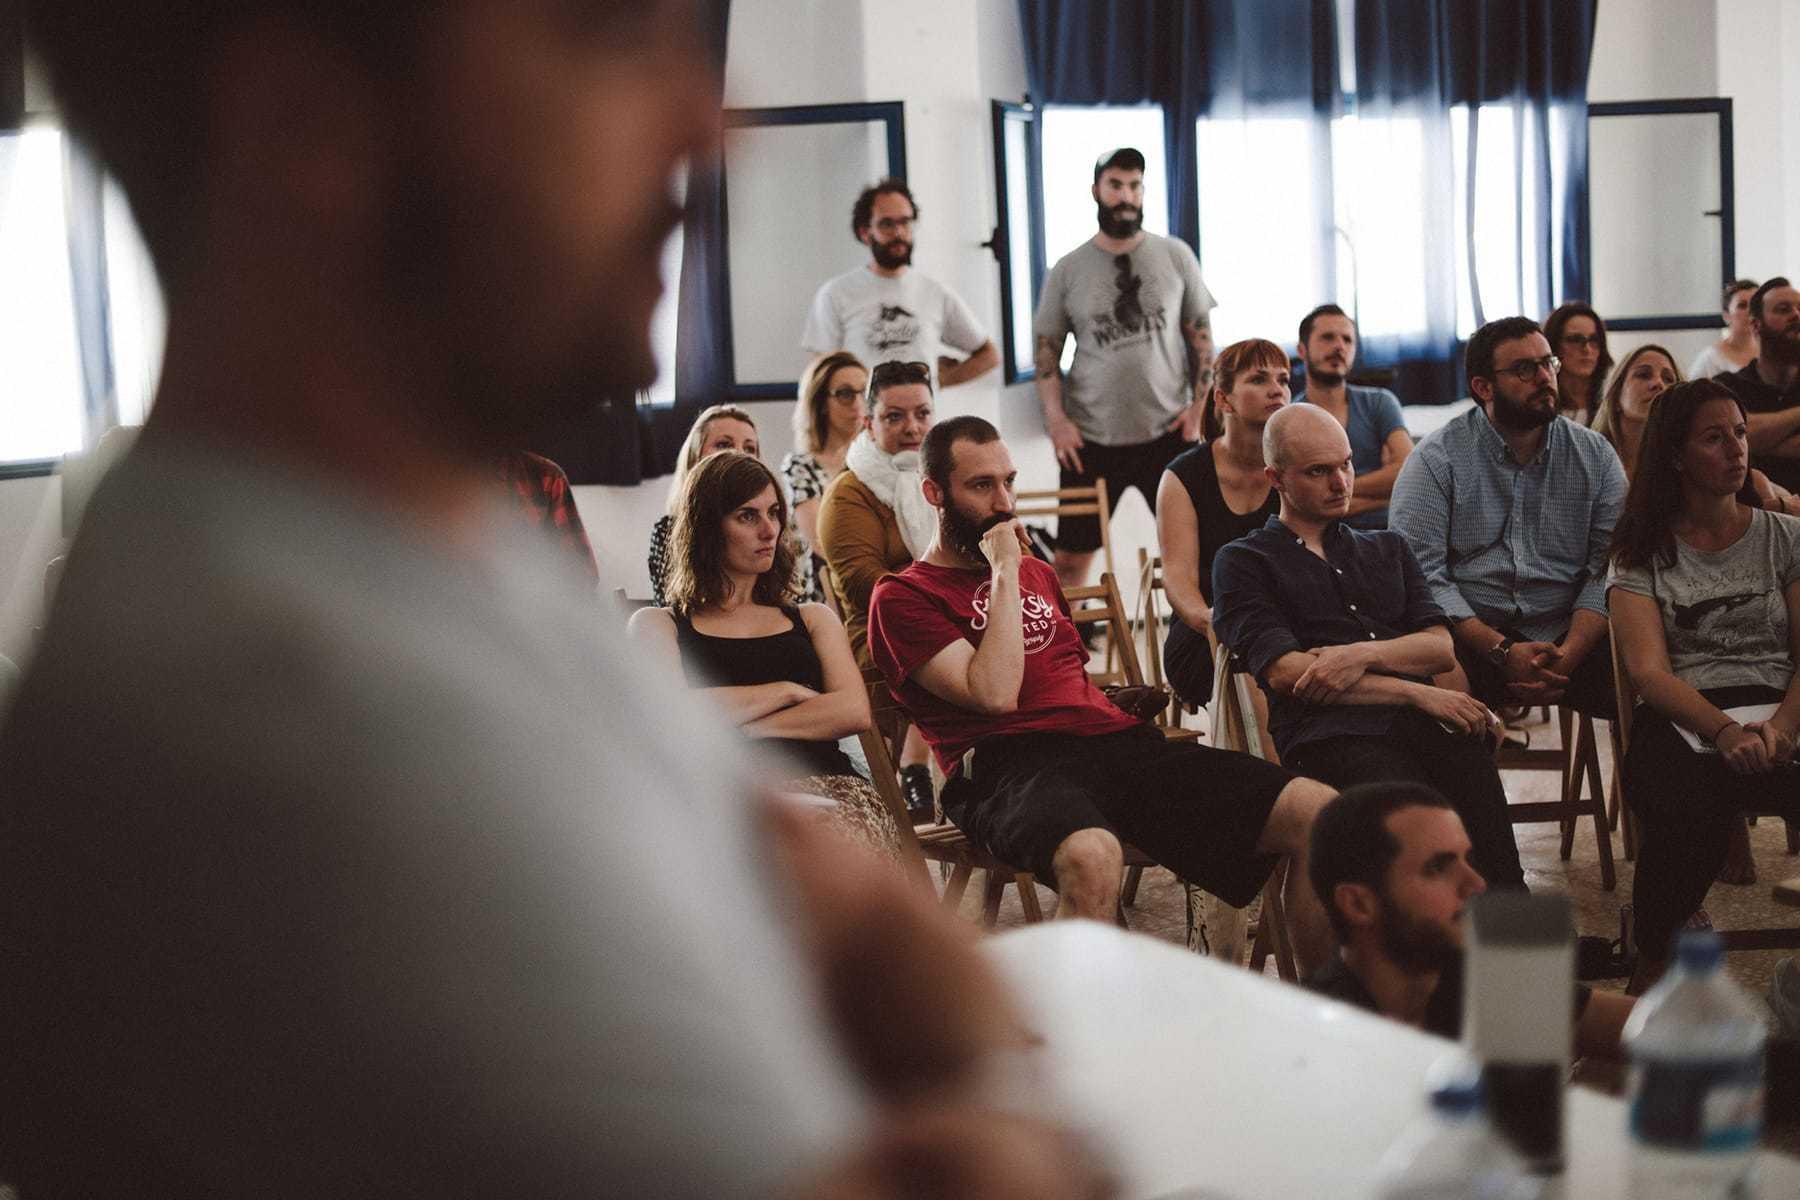 wolves_workshop_hilario_sanchez_fotografo_boda_españa_352